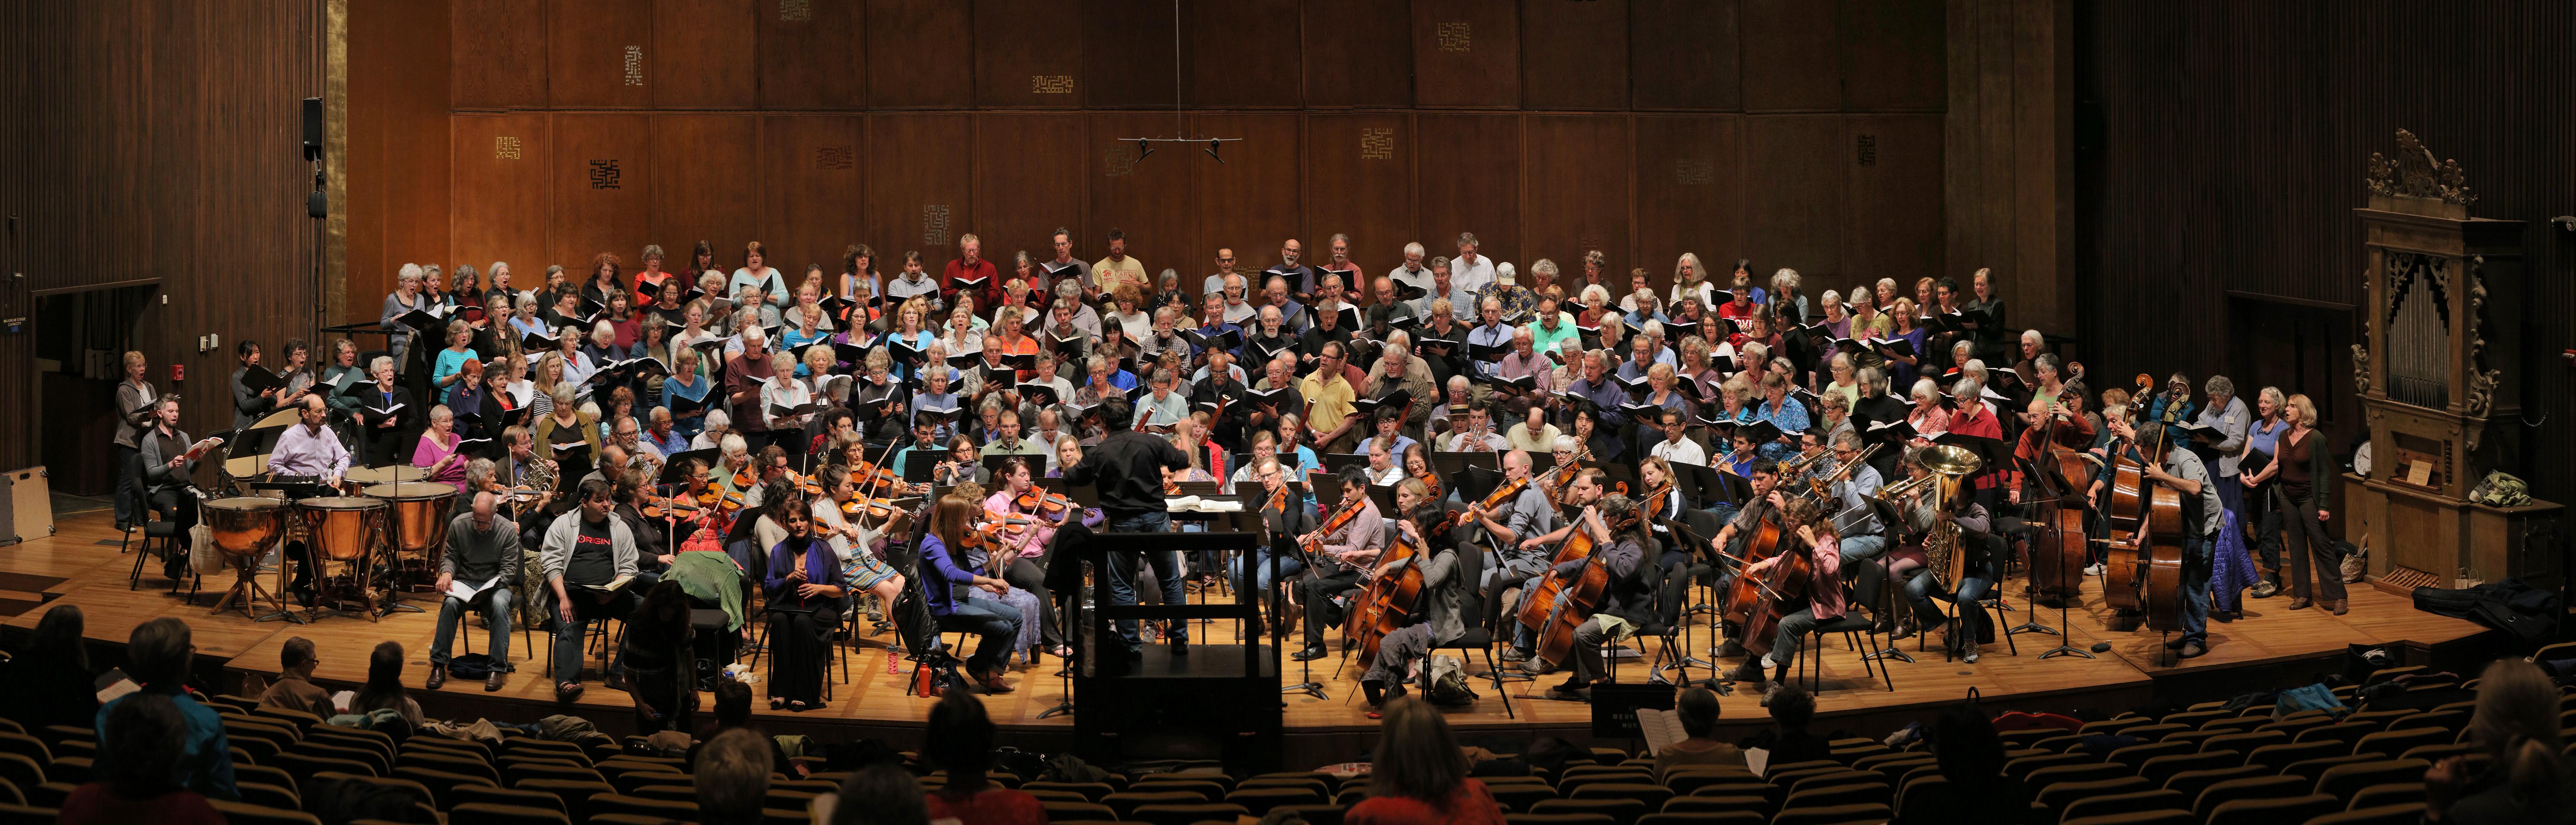 s15-rehearsalpan Rehearsal,  BCCO Spring Concert,  Hertz Hall, UC Berkeley,  Berkeley, California, 2015